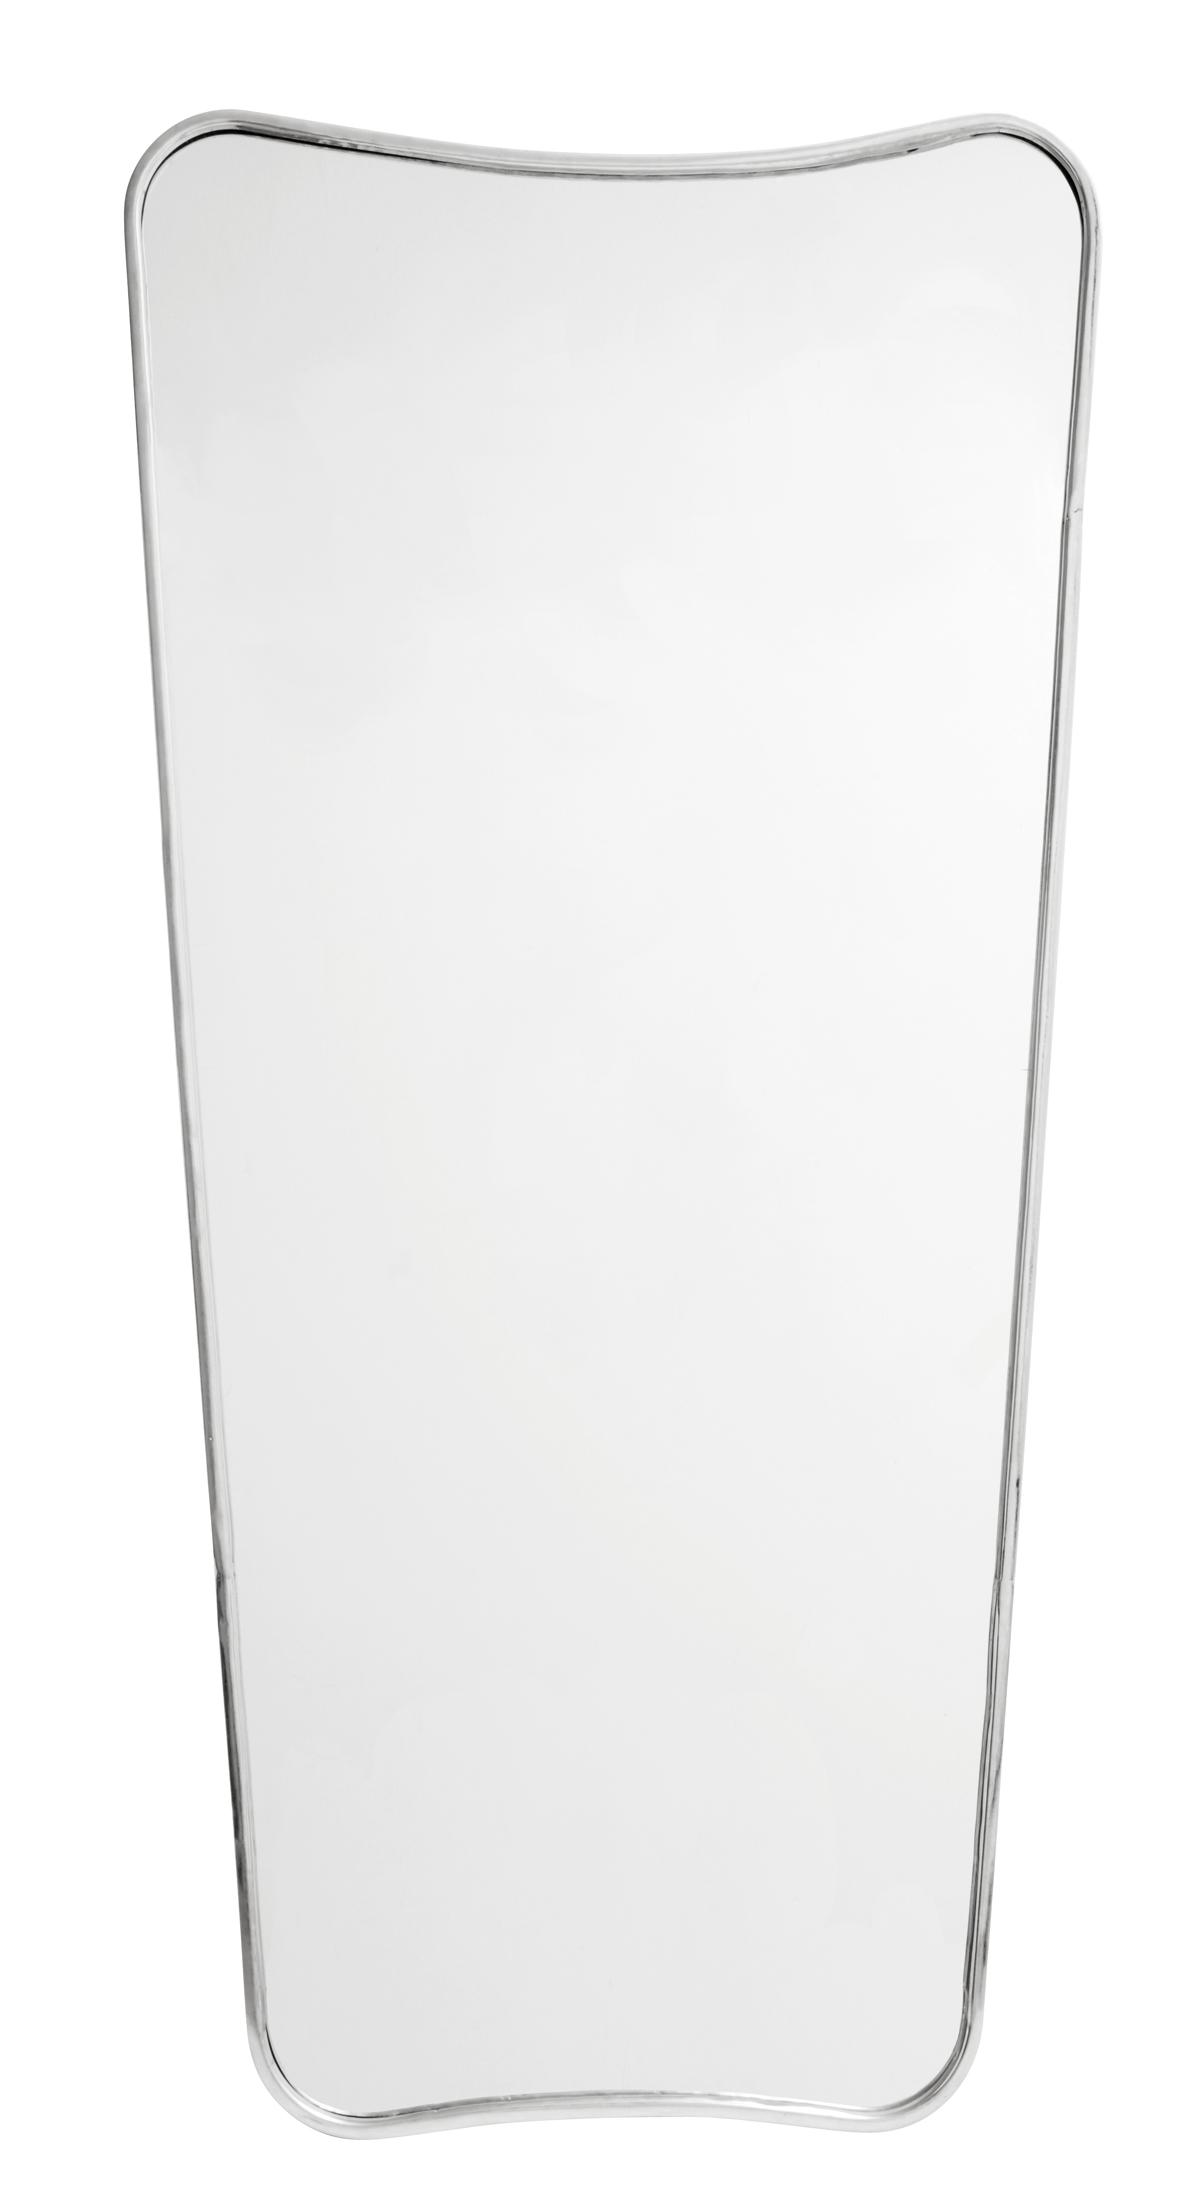 Nordal - Royal Spejl L - Sølvfinish Nordal